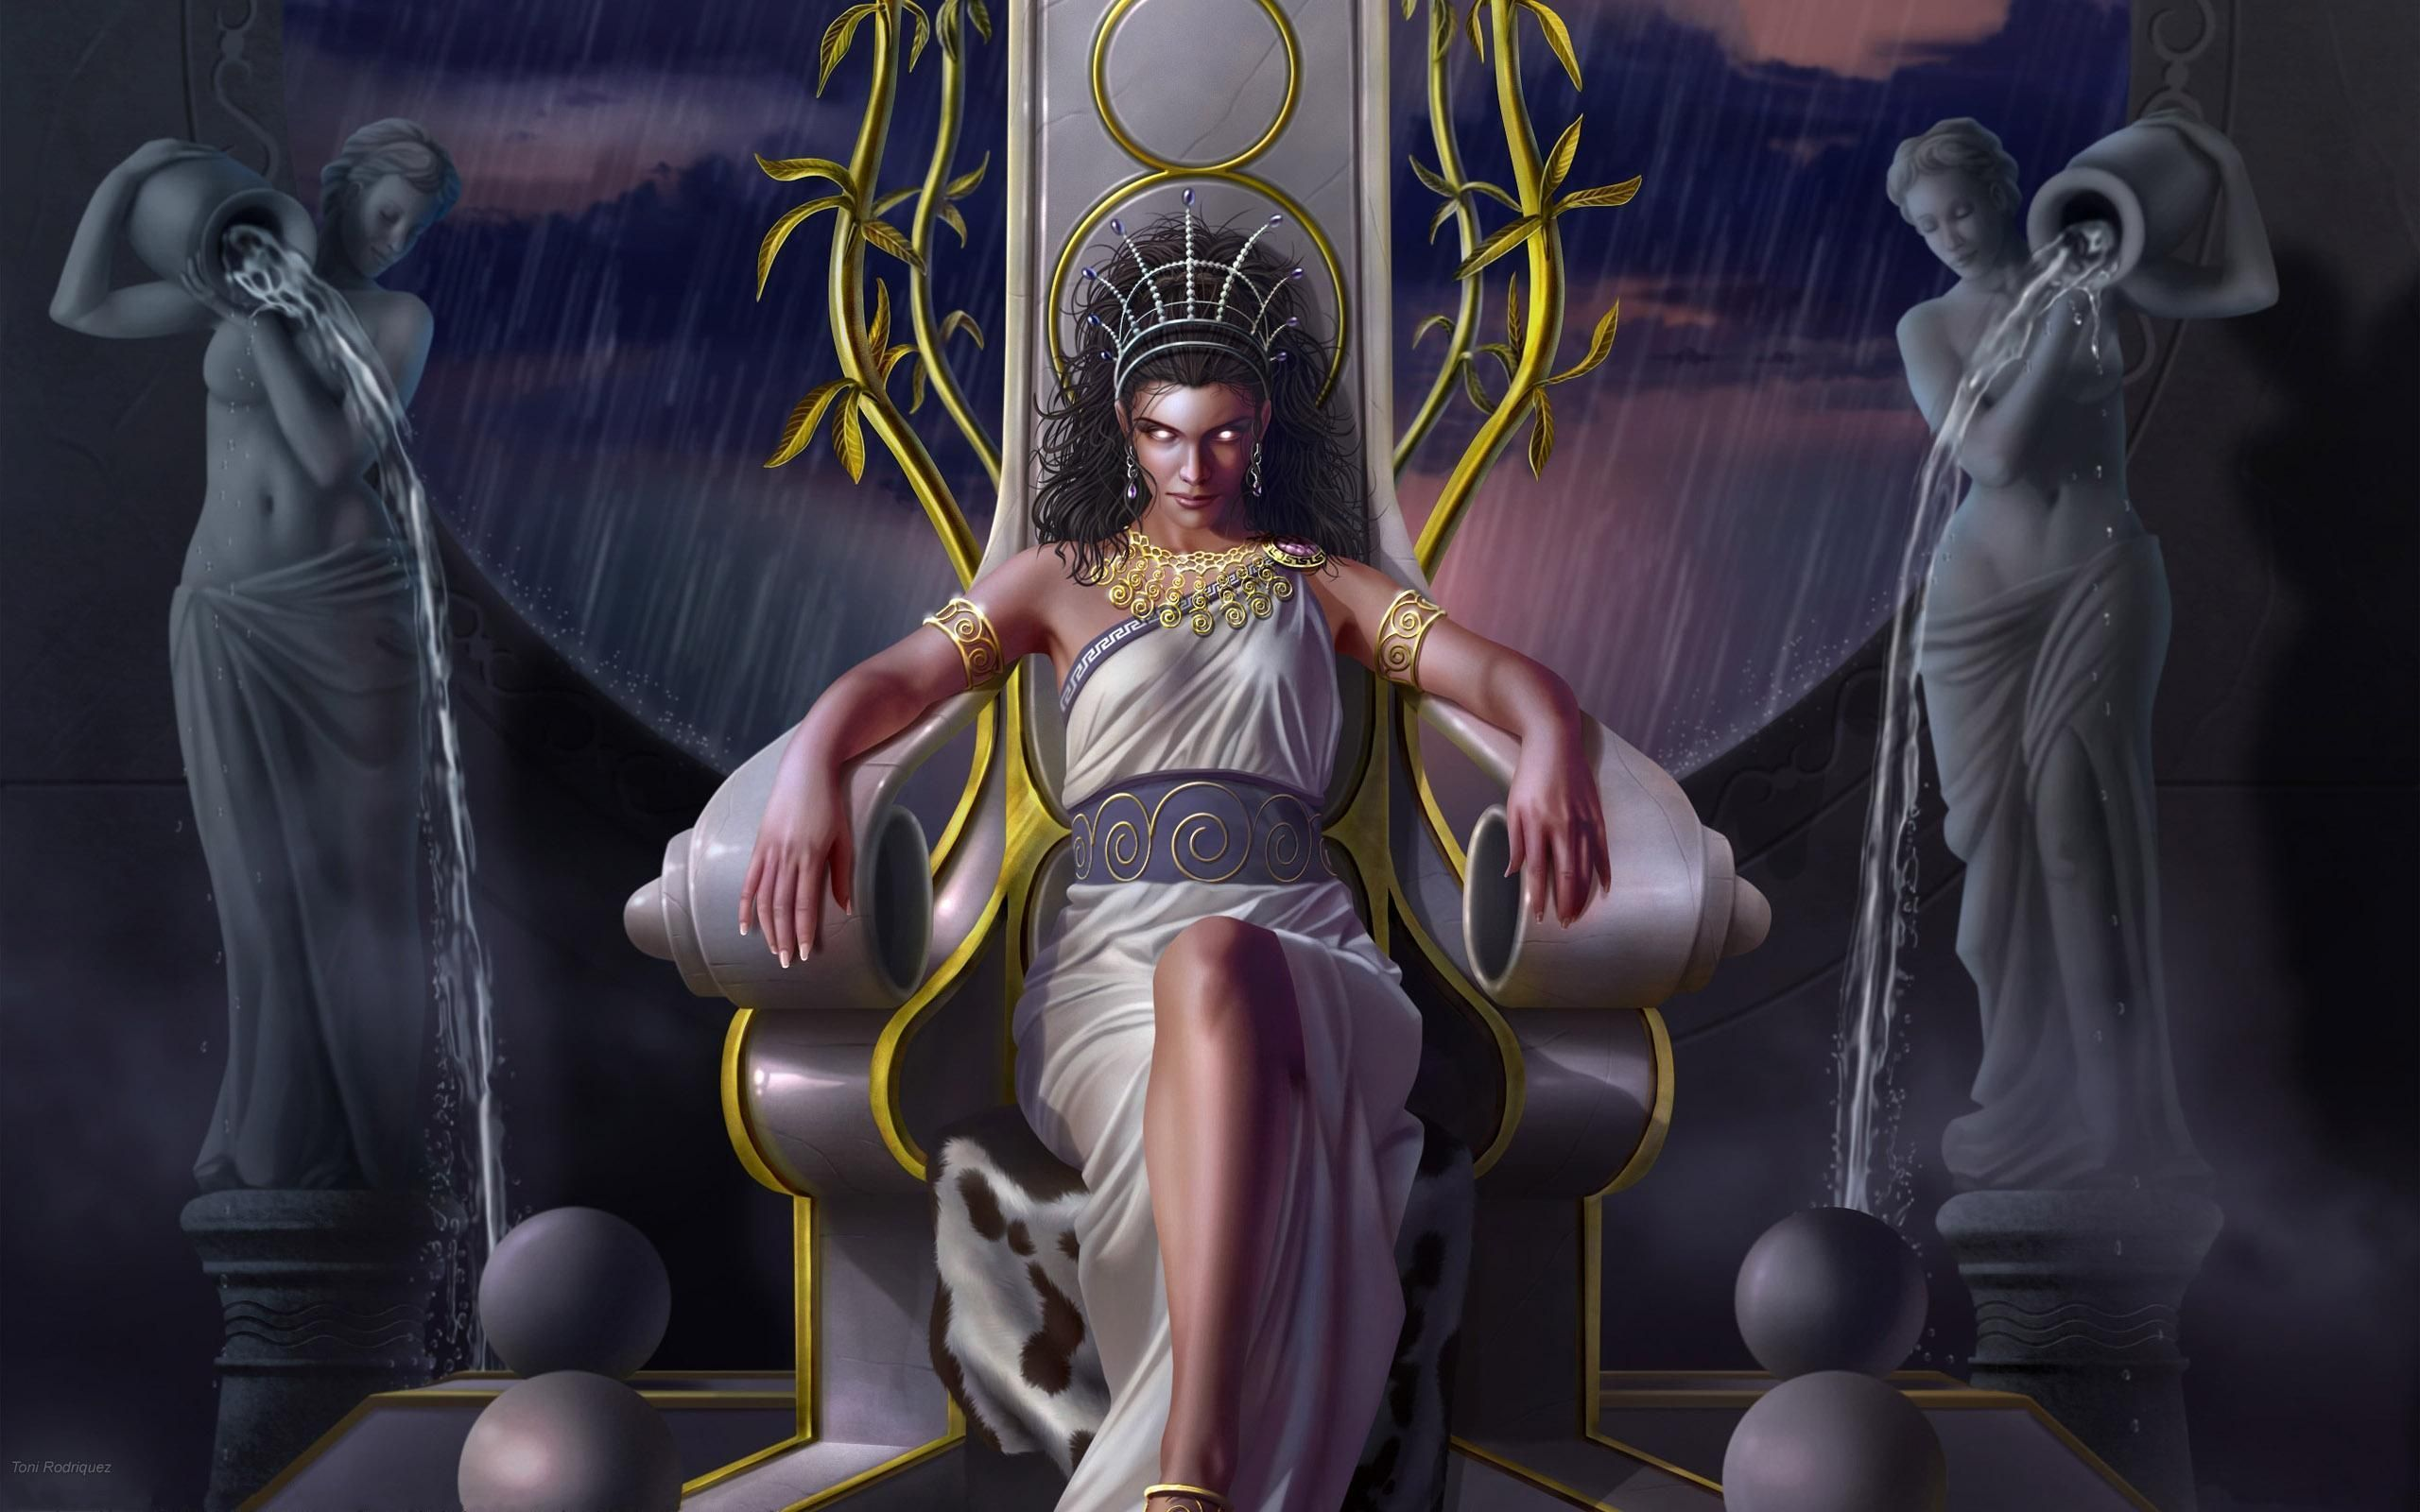 Pin De Shawn Lucas Em Mythology